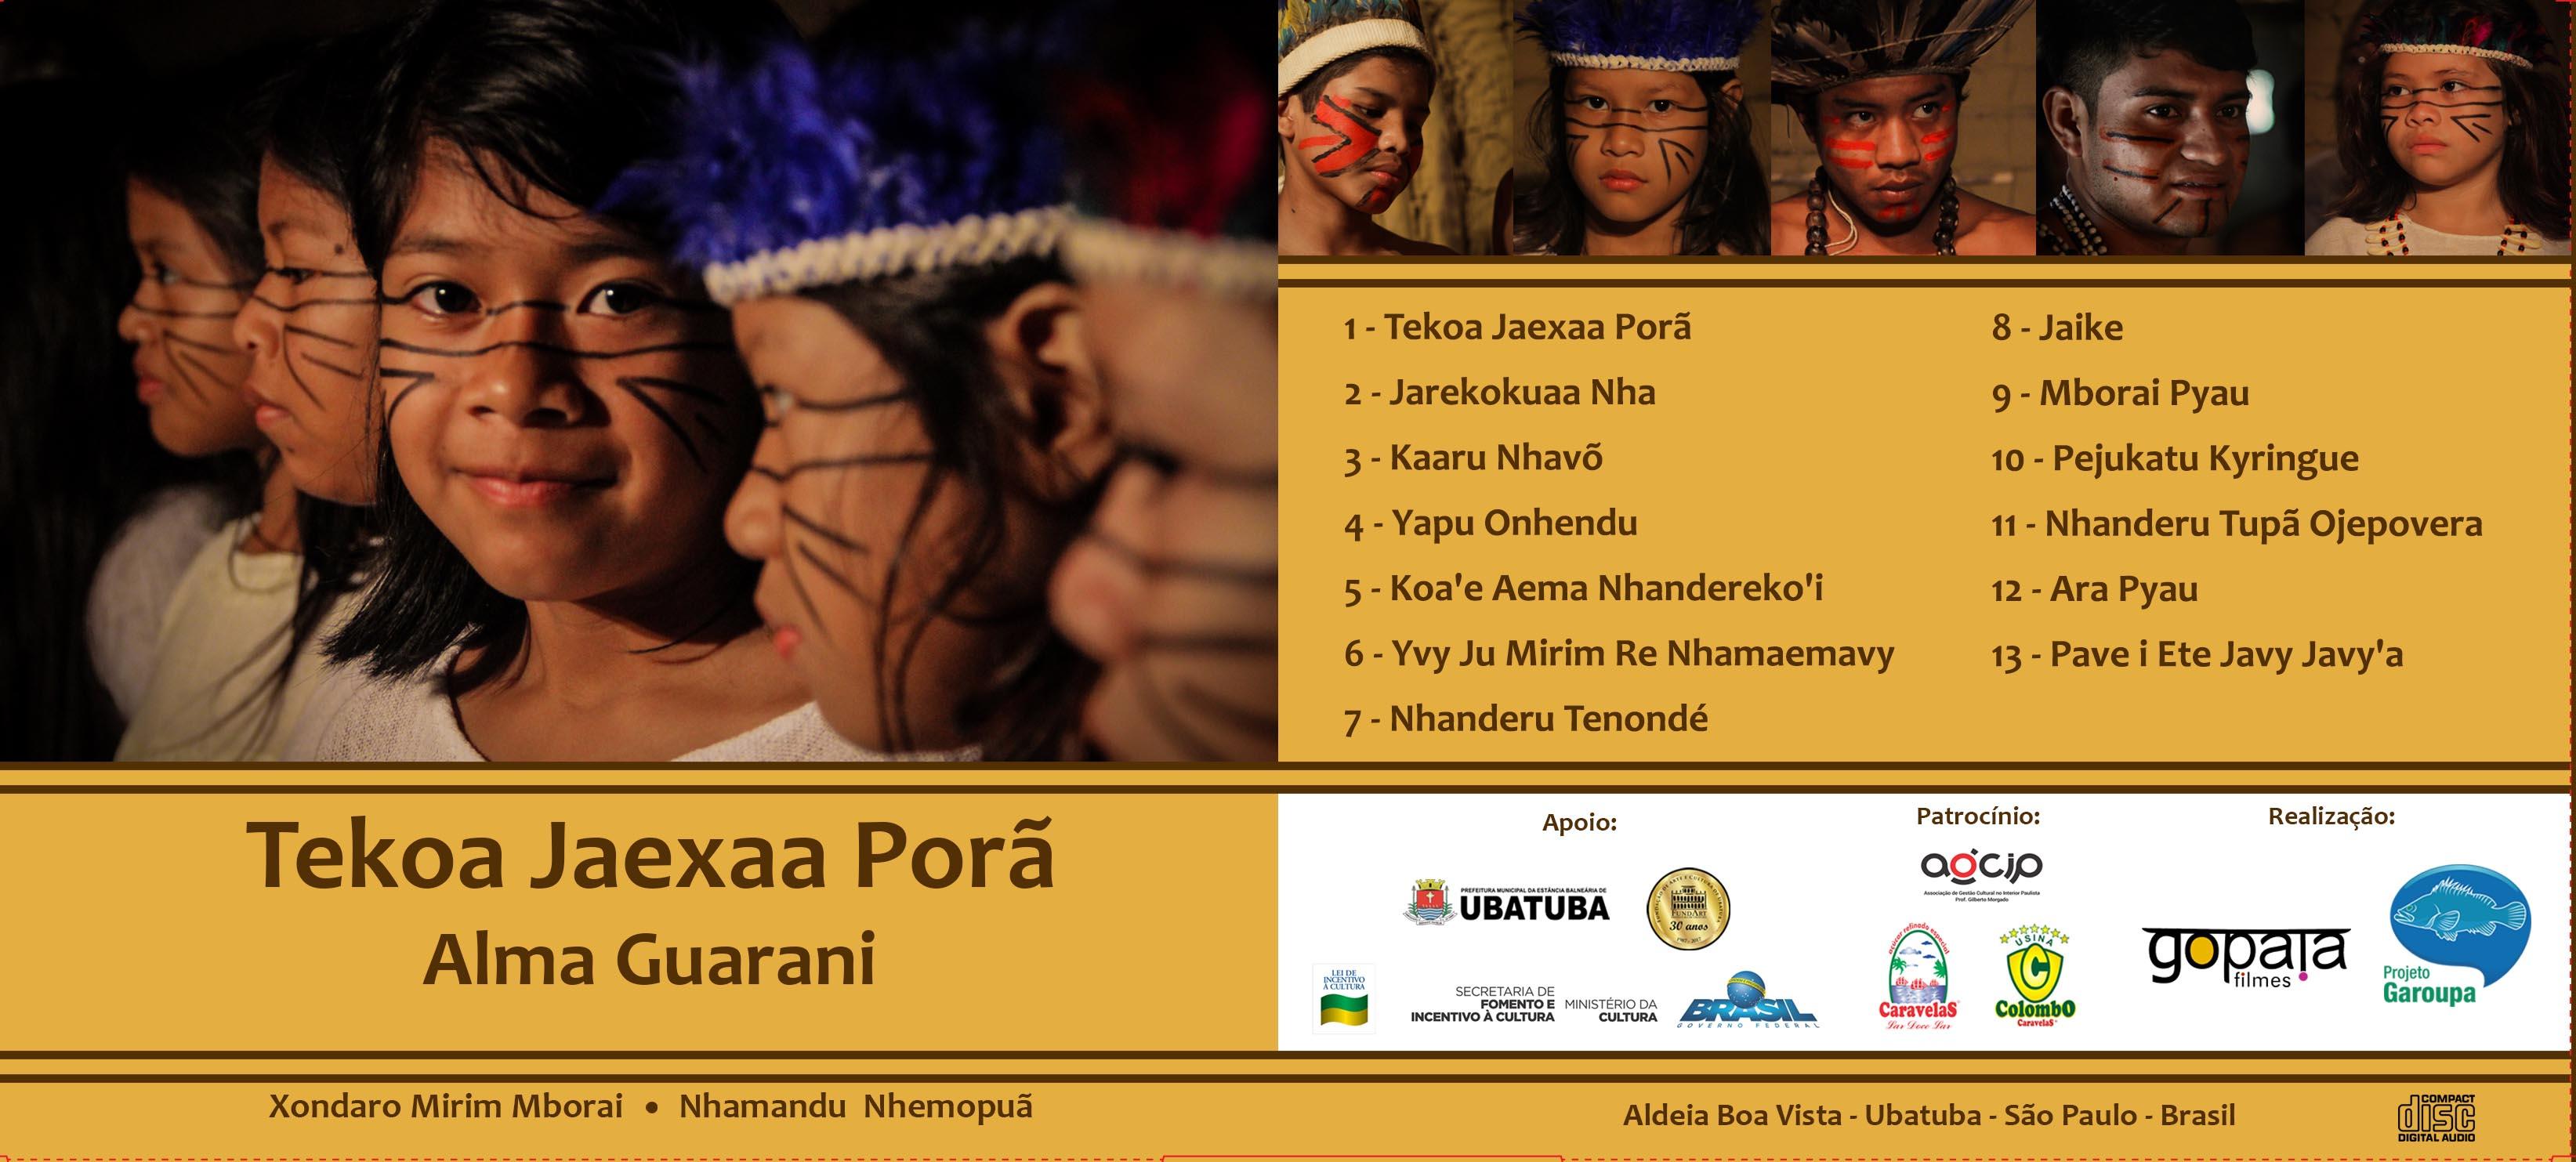 Folclore Guarani